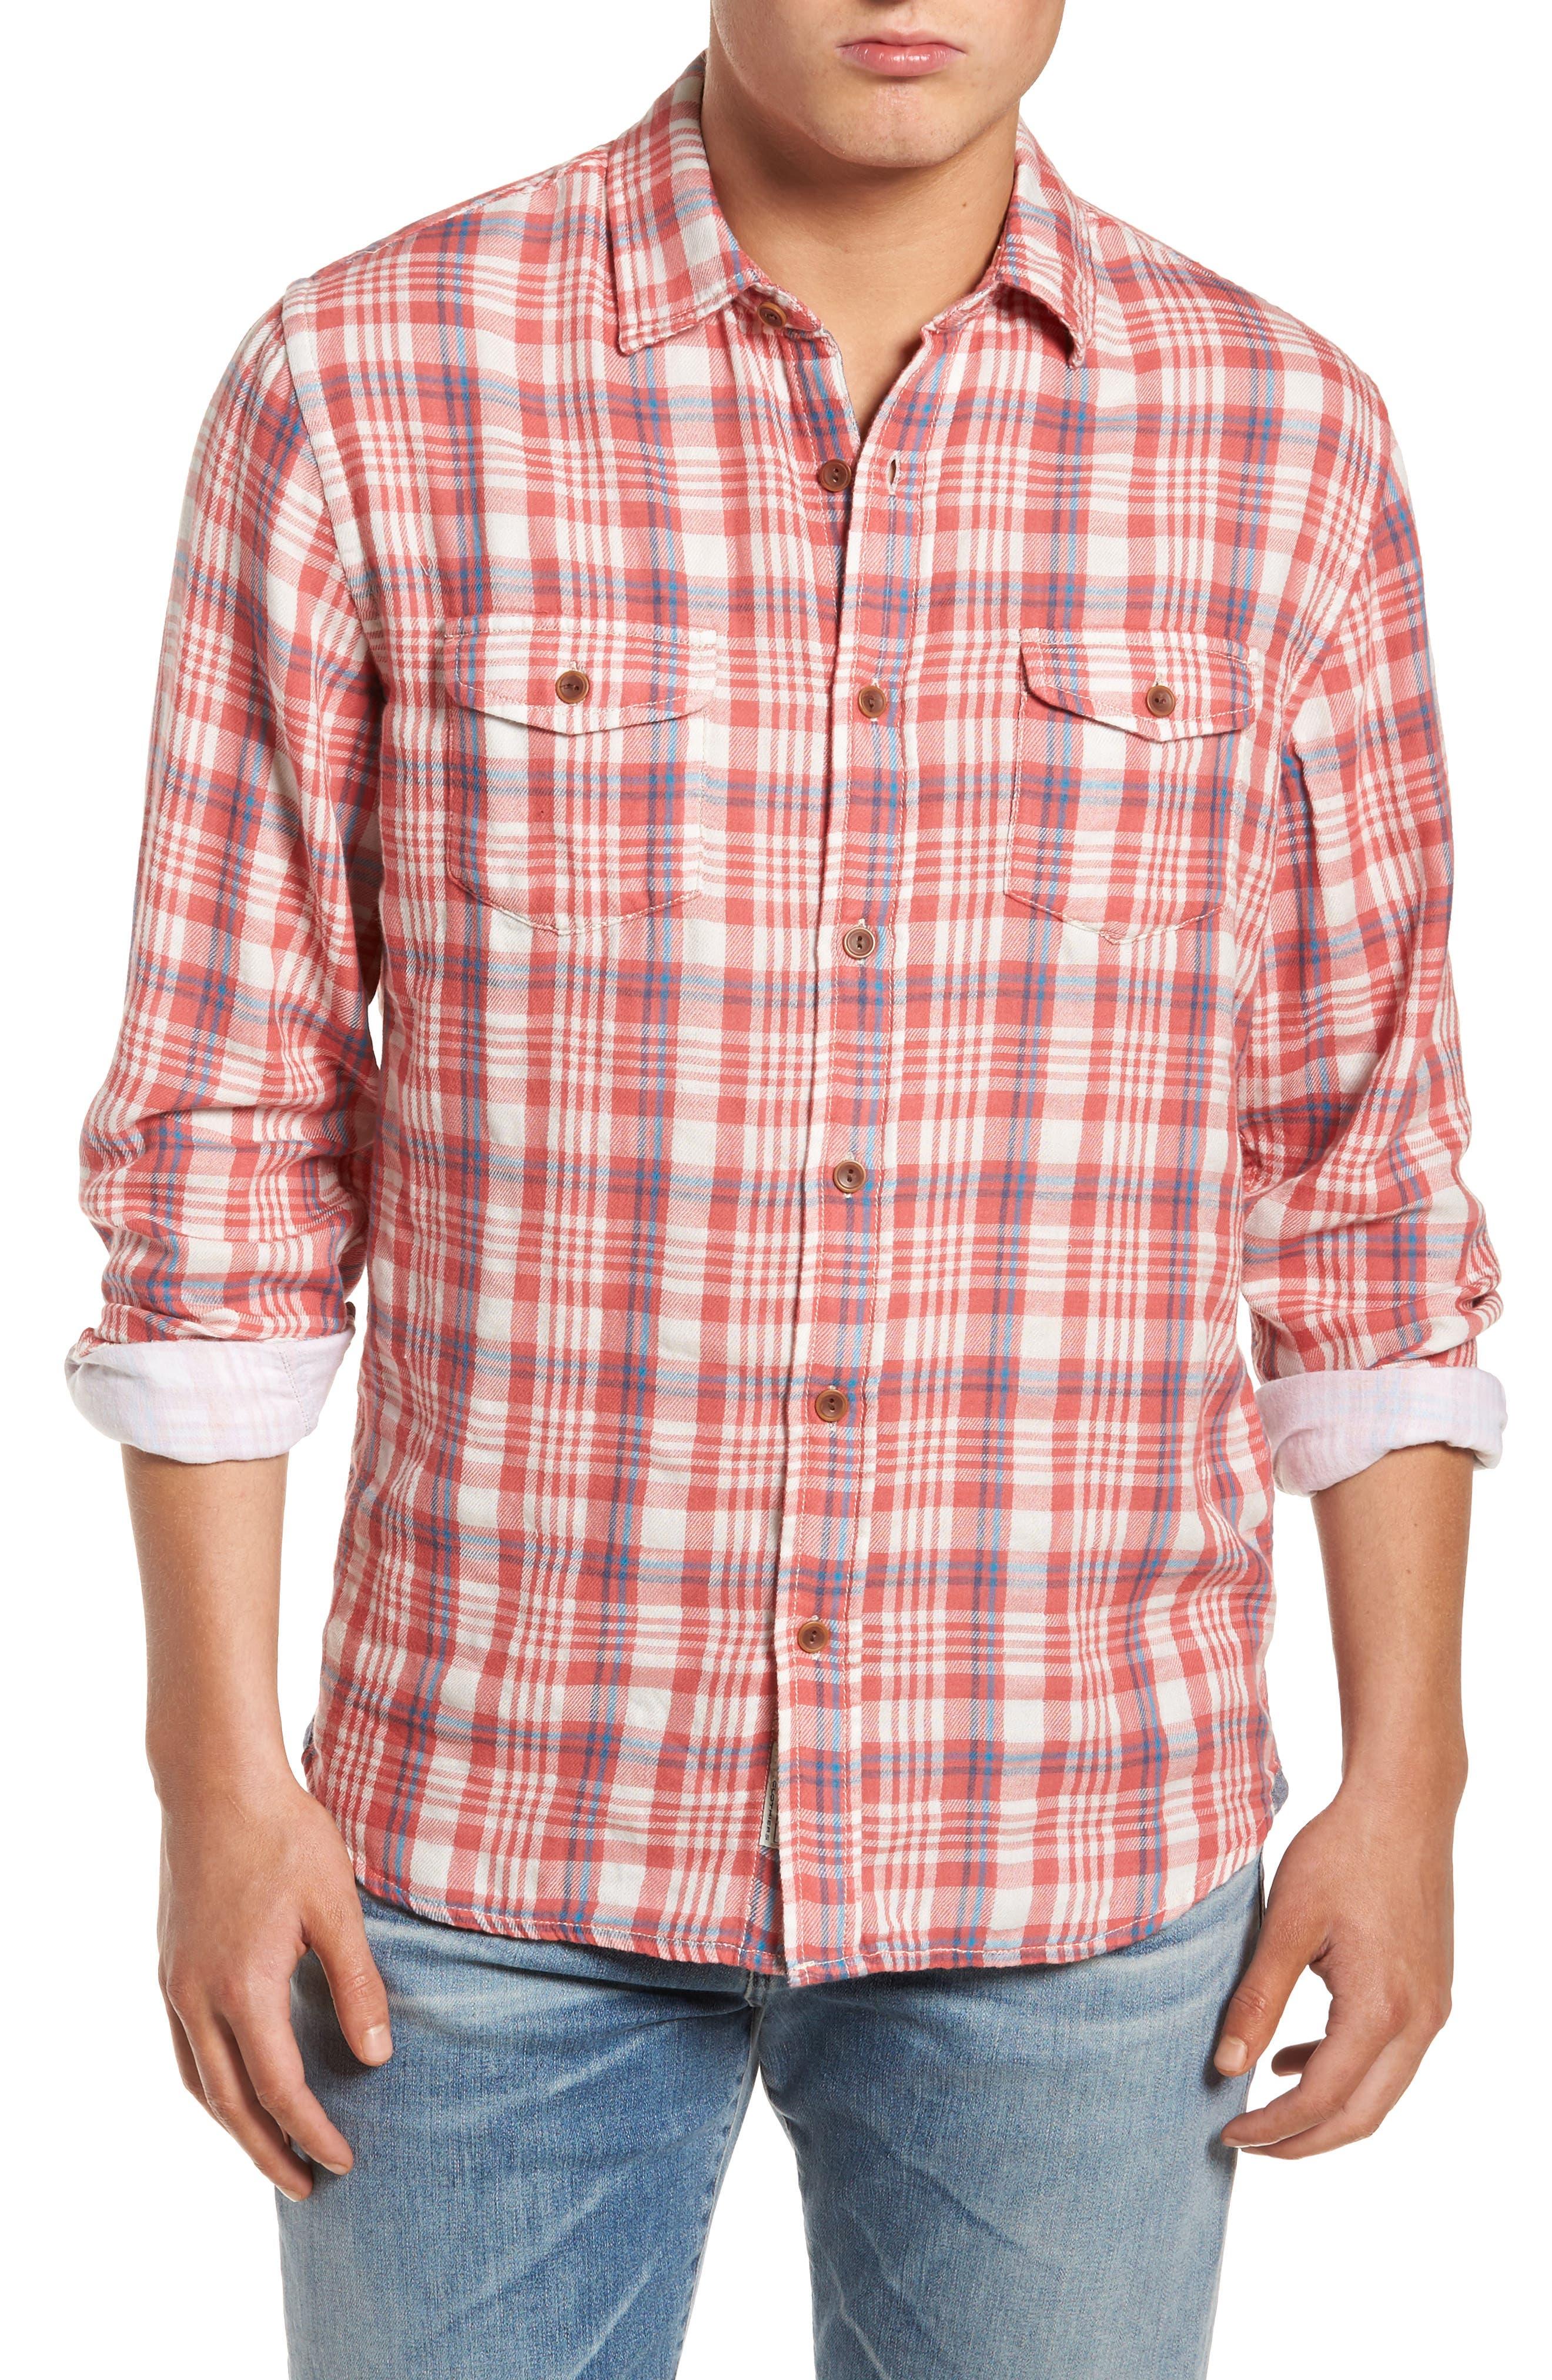 Barnard Slim Fit Plaid Sport Shirt,                         Main,                         color, Red Cream Plaid